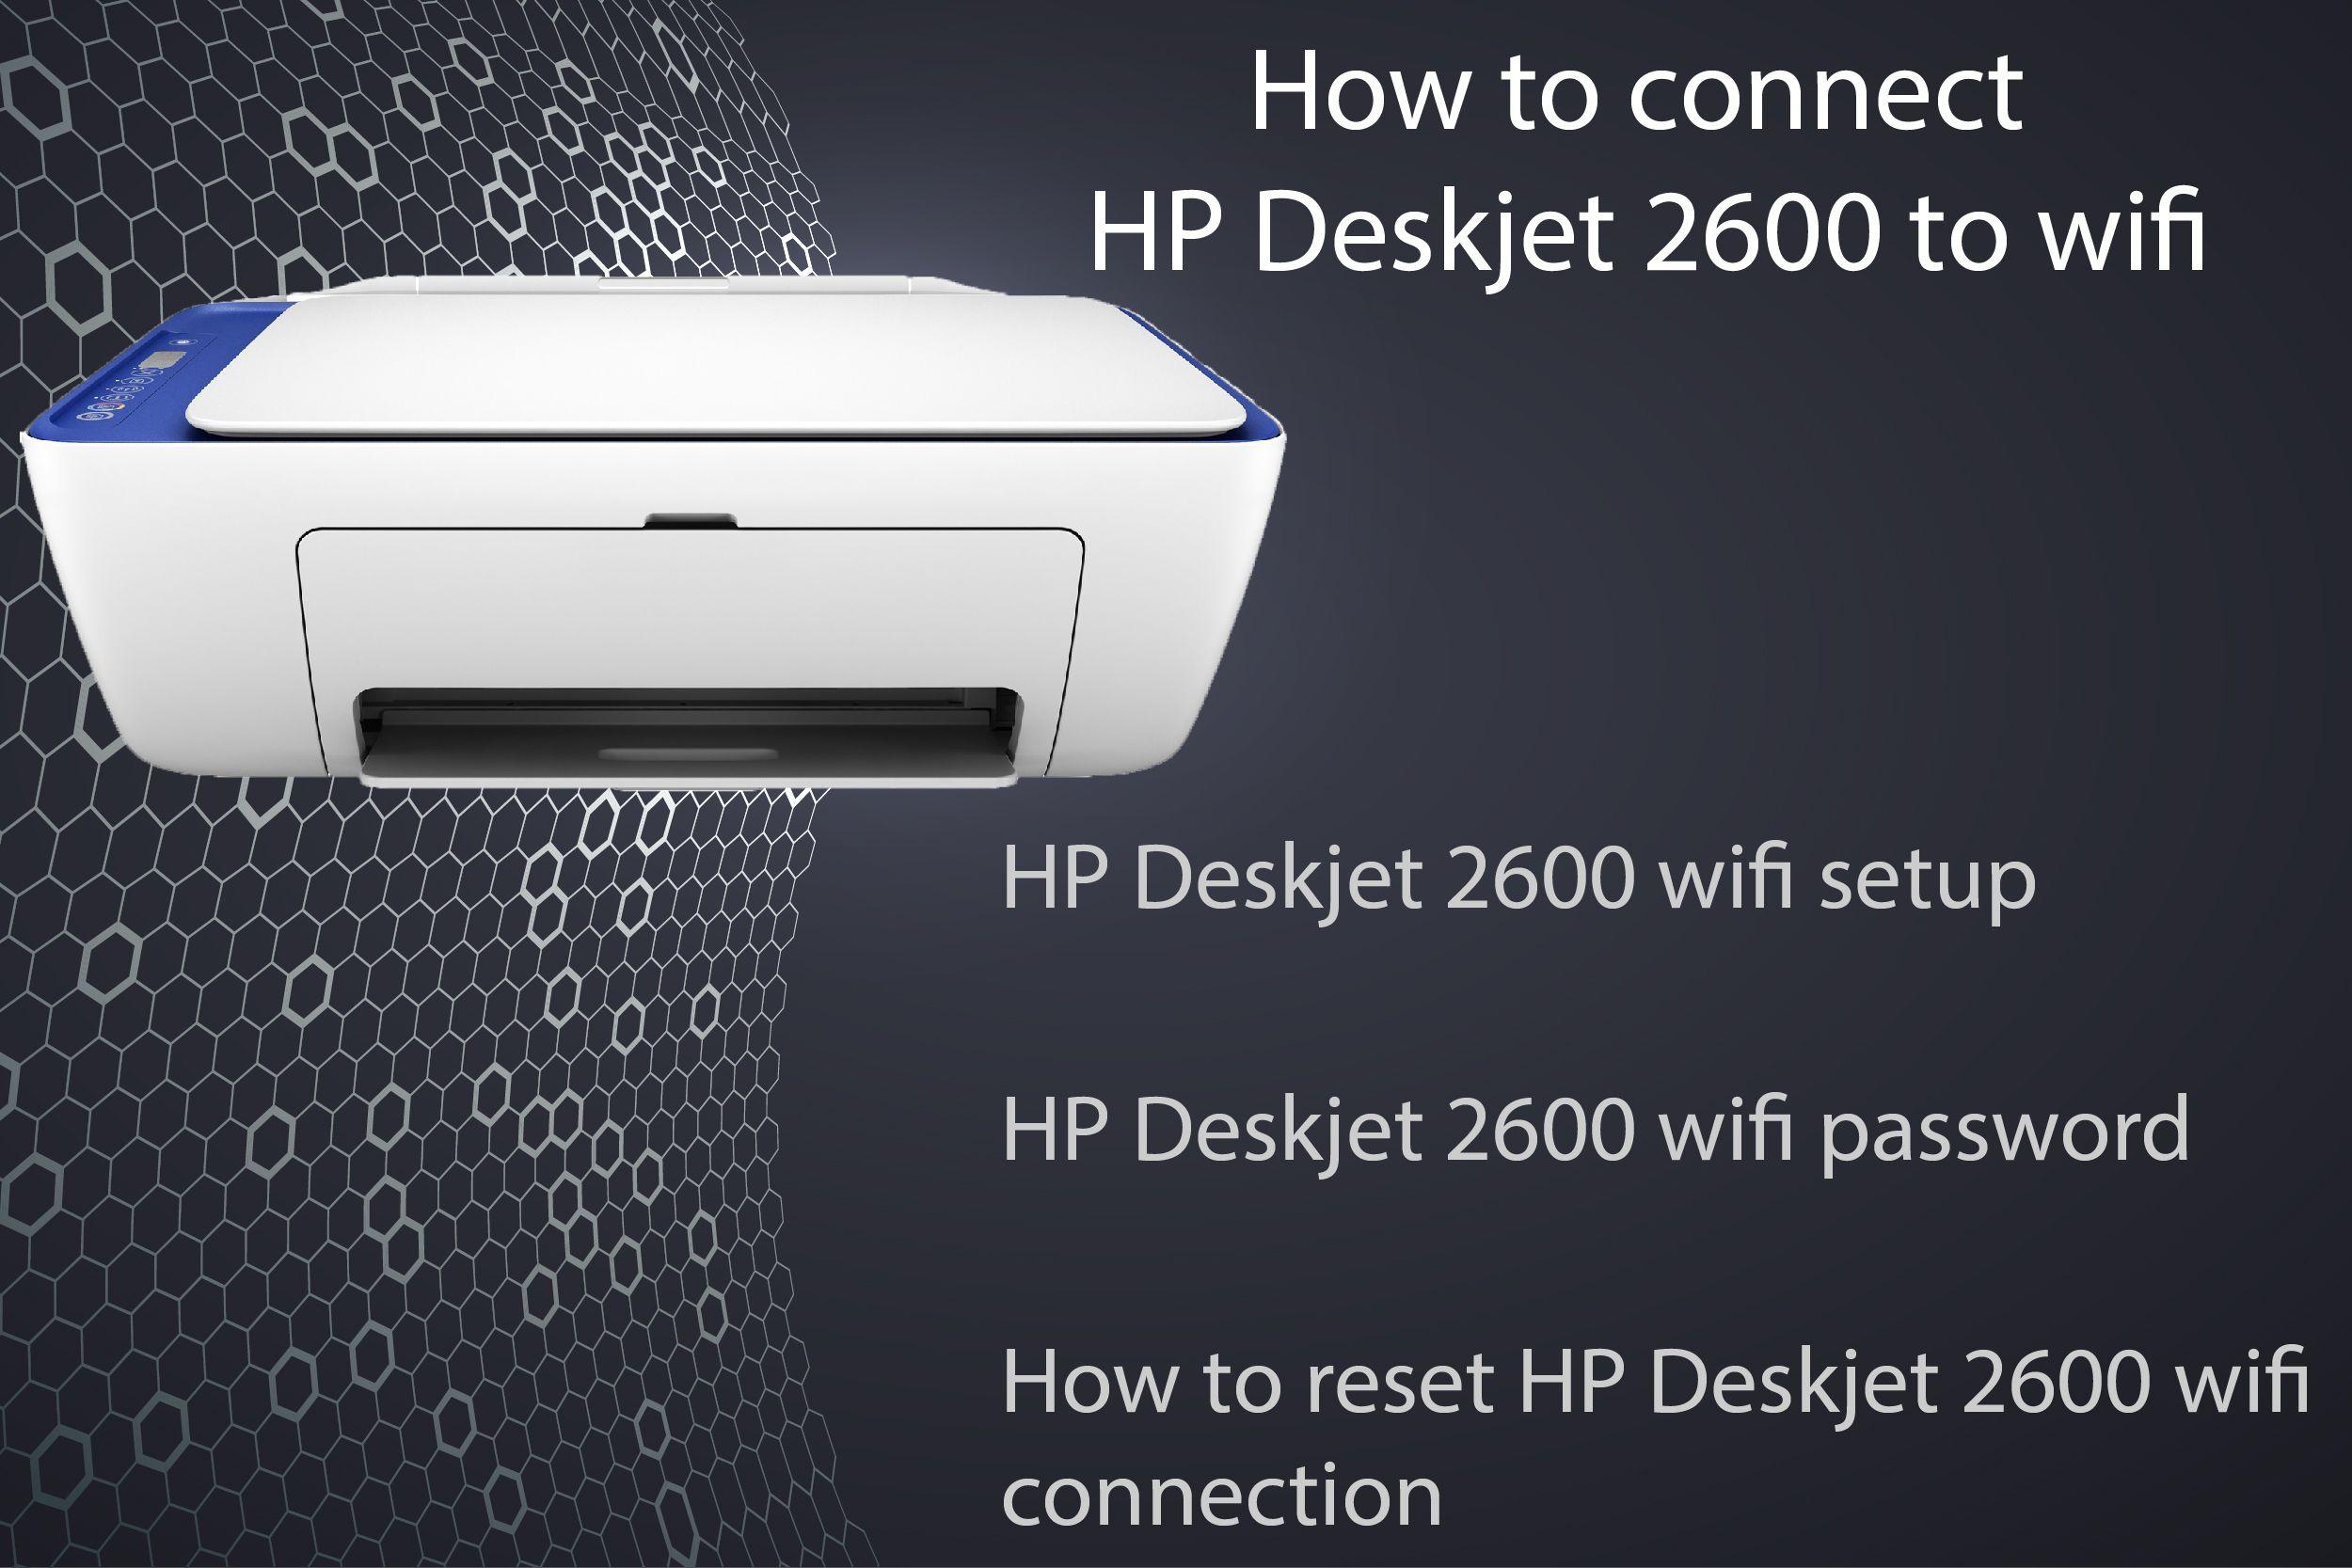 Solutions available for HP Deskjet 2600 wifi setup, finding